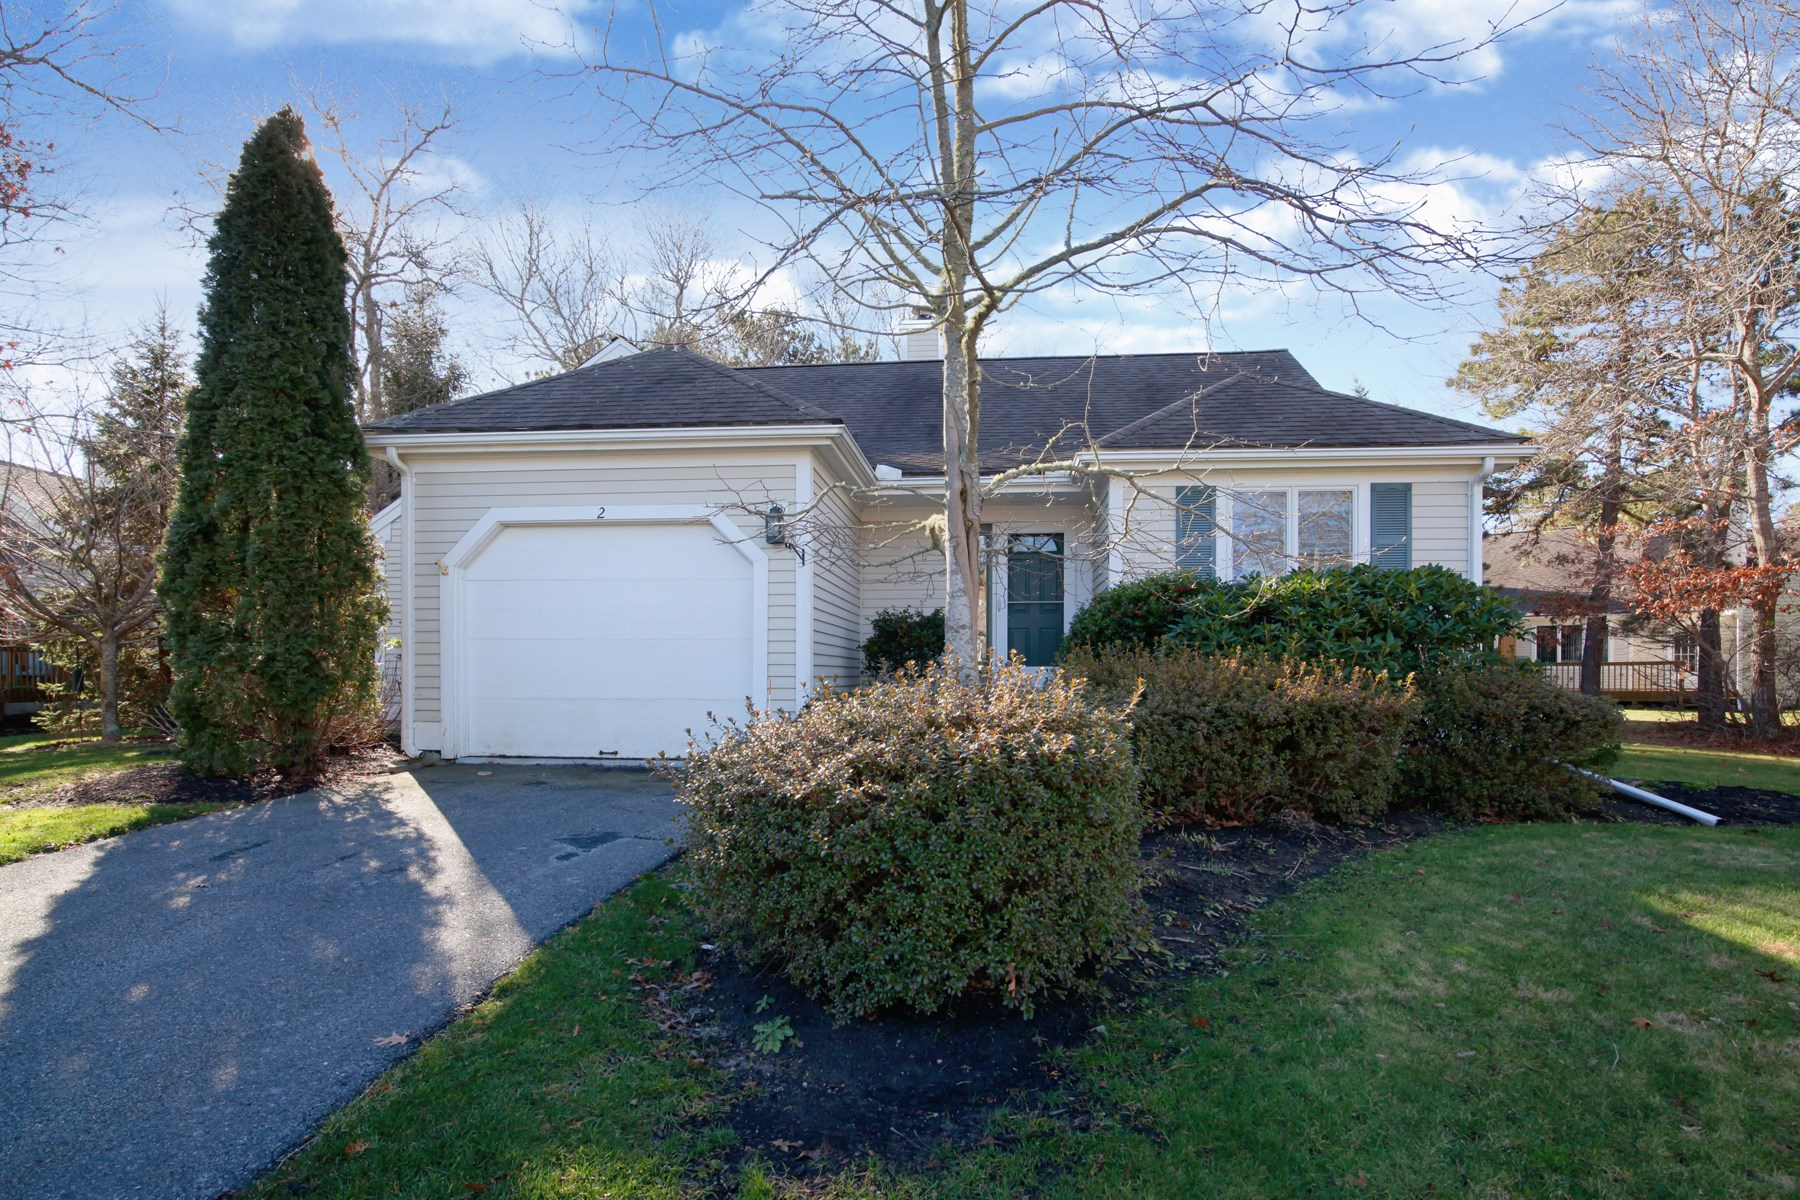 Condominium for Sale at 2 Dogleg Drive Mashpee, Massachusetts 02649 United States